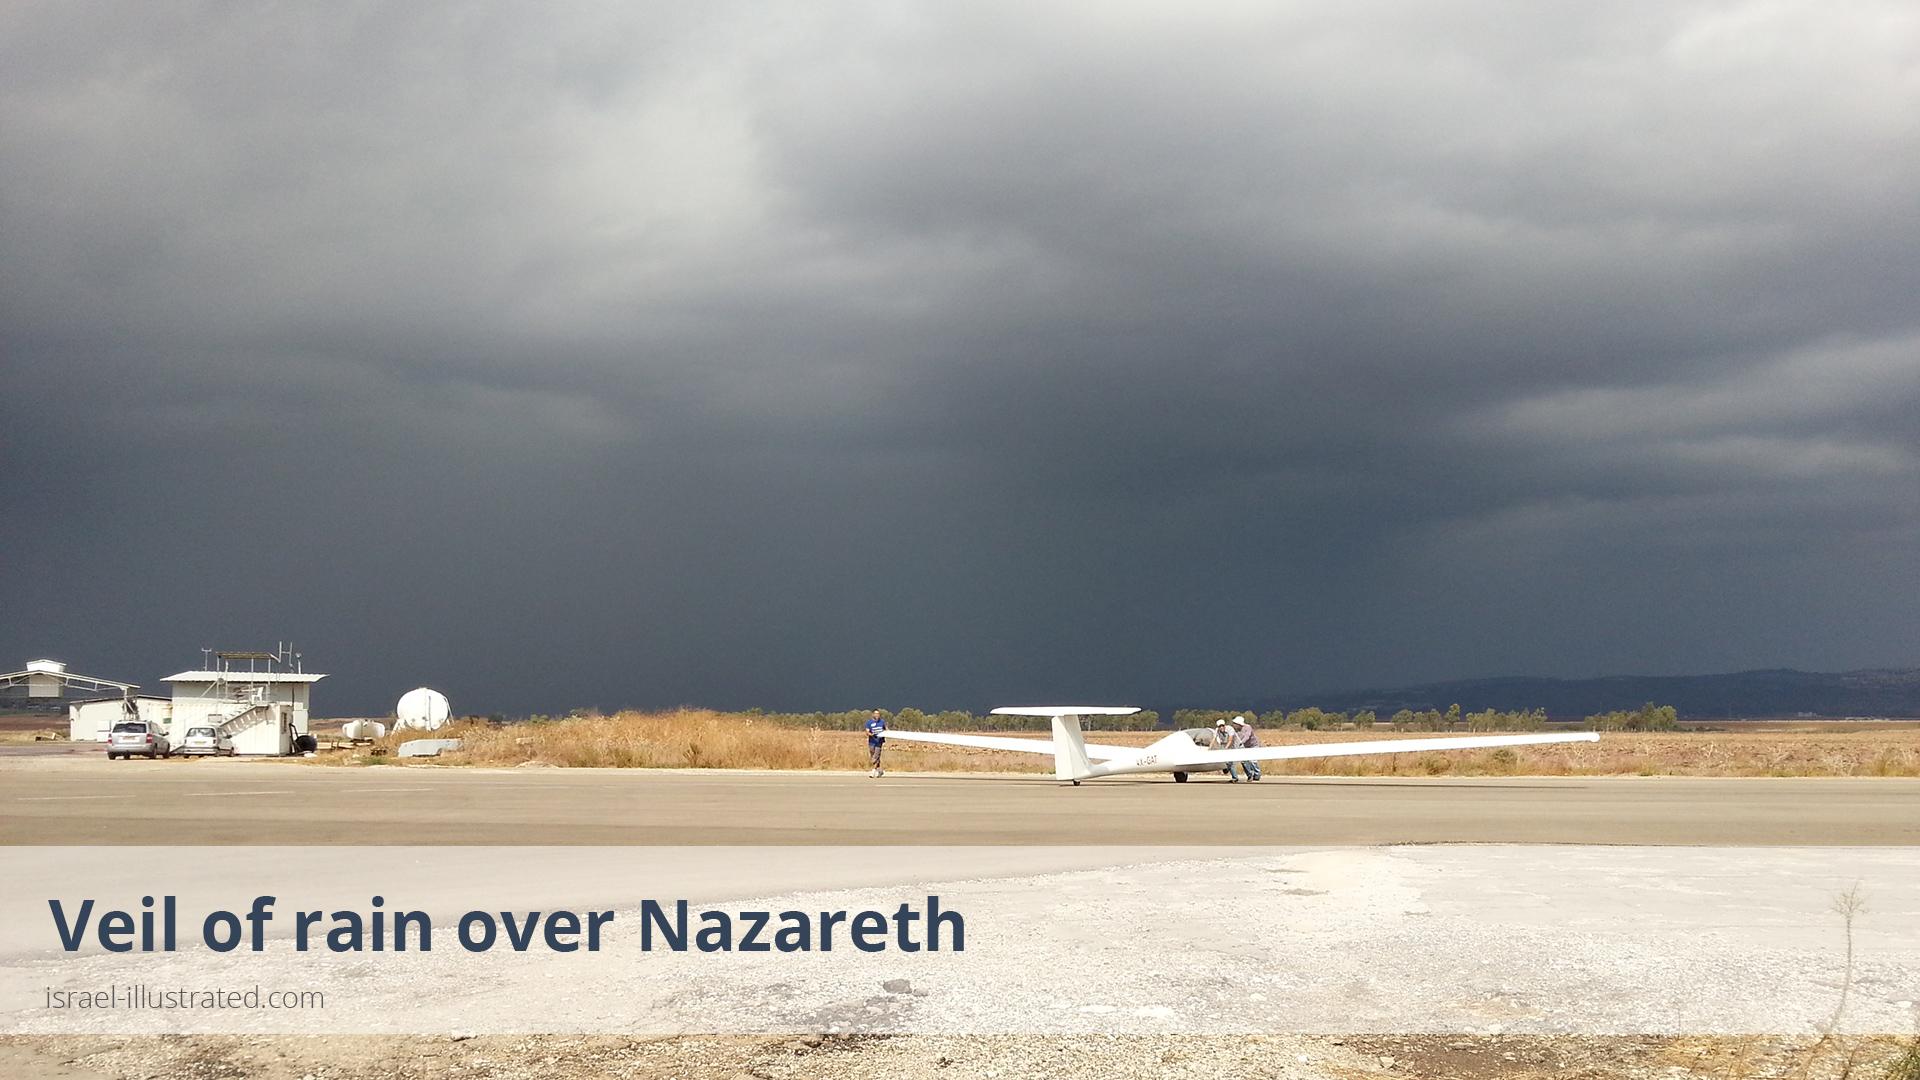 Rain over Nazareth